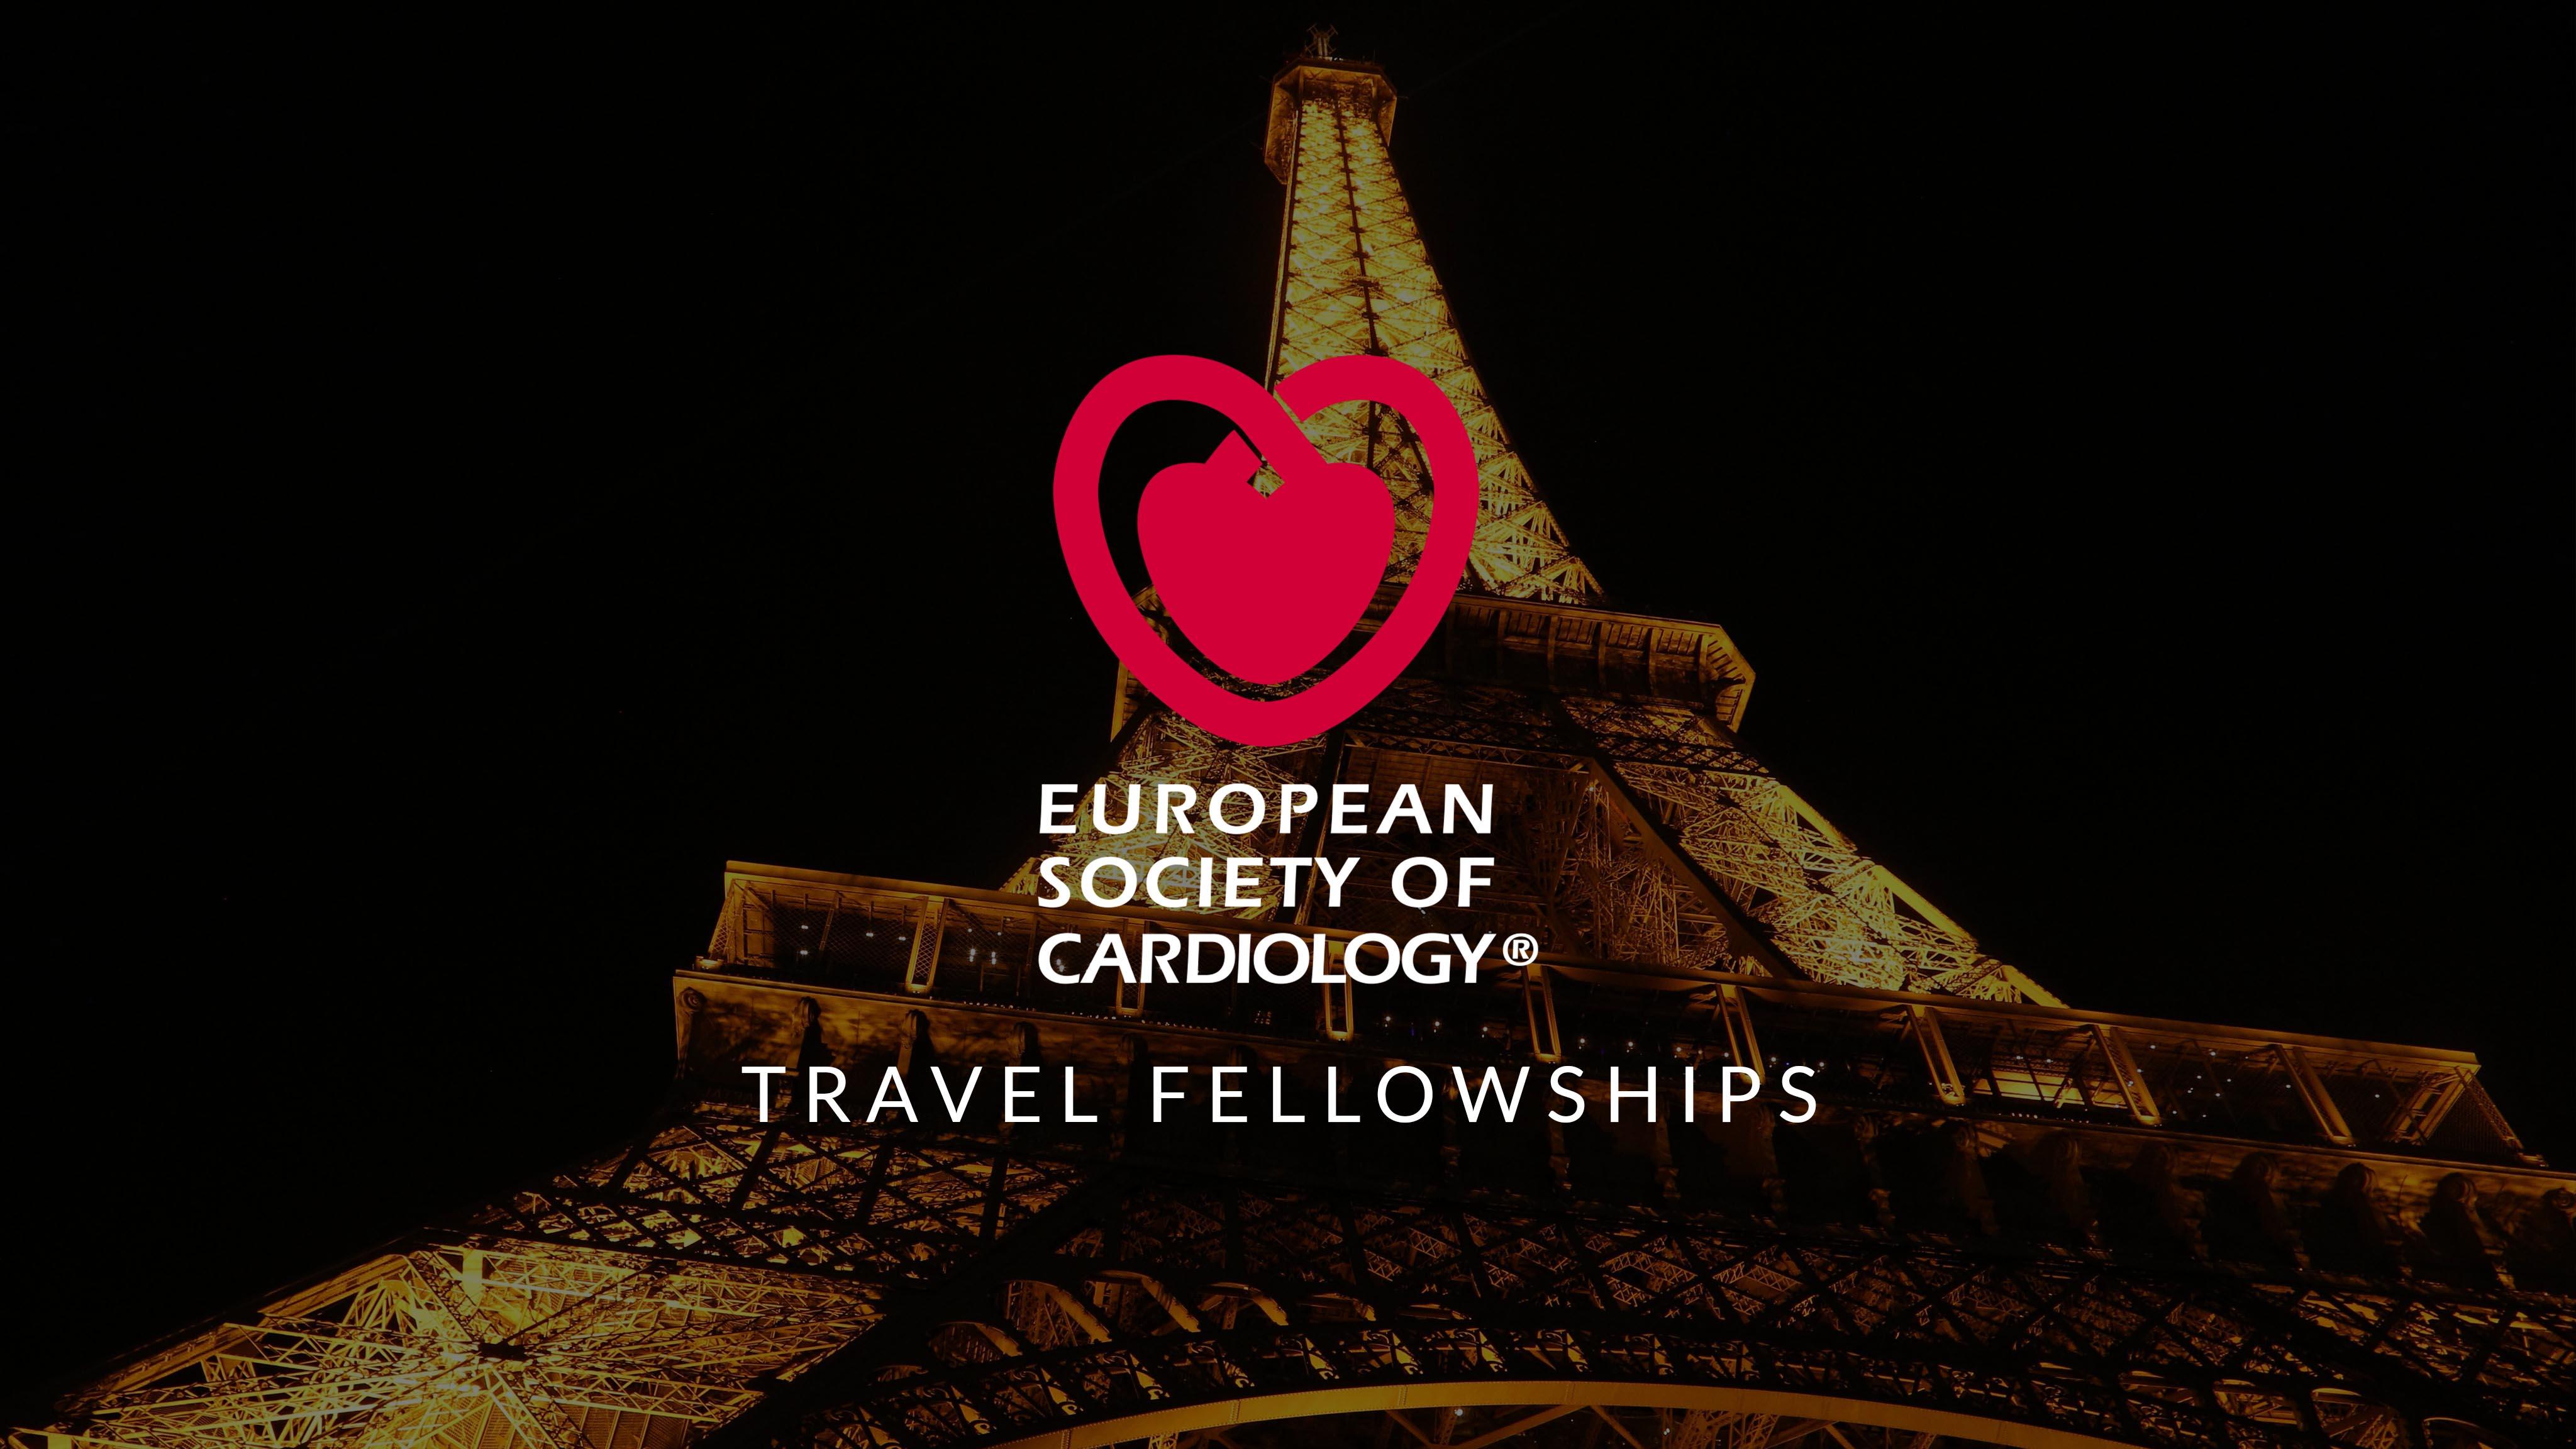 ESC & ERS Travelling Fellowship Award winners